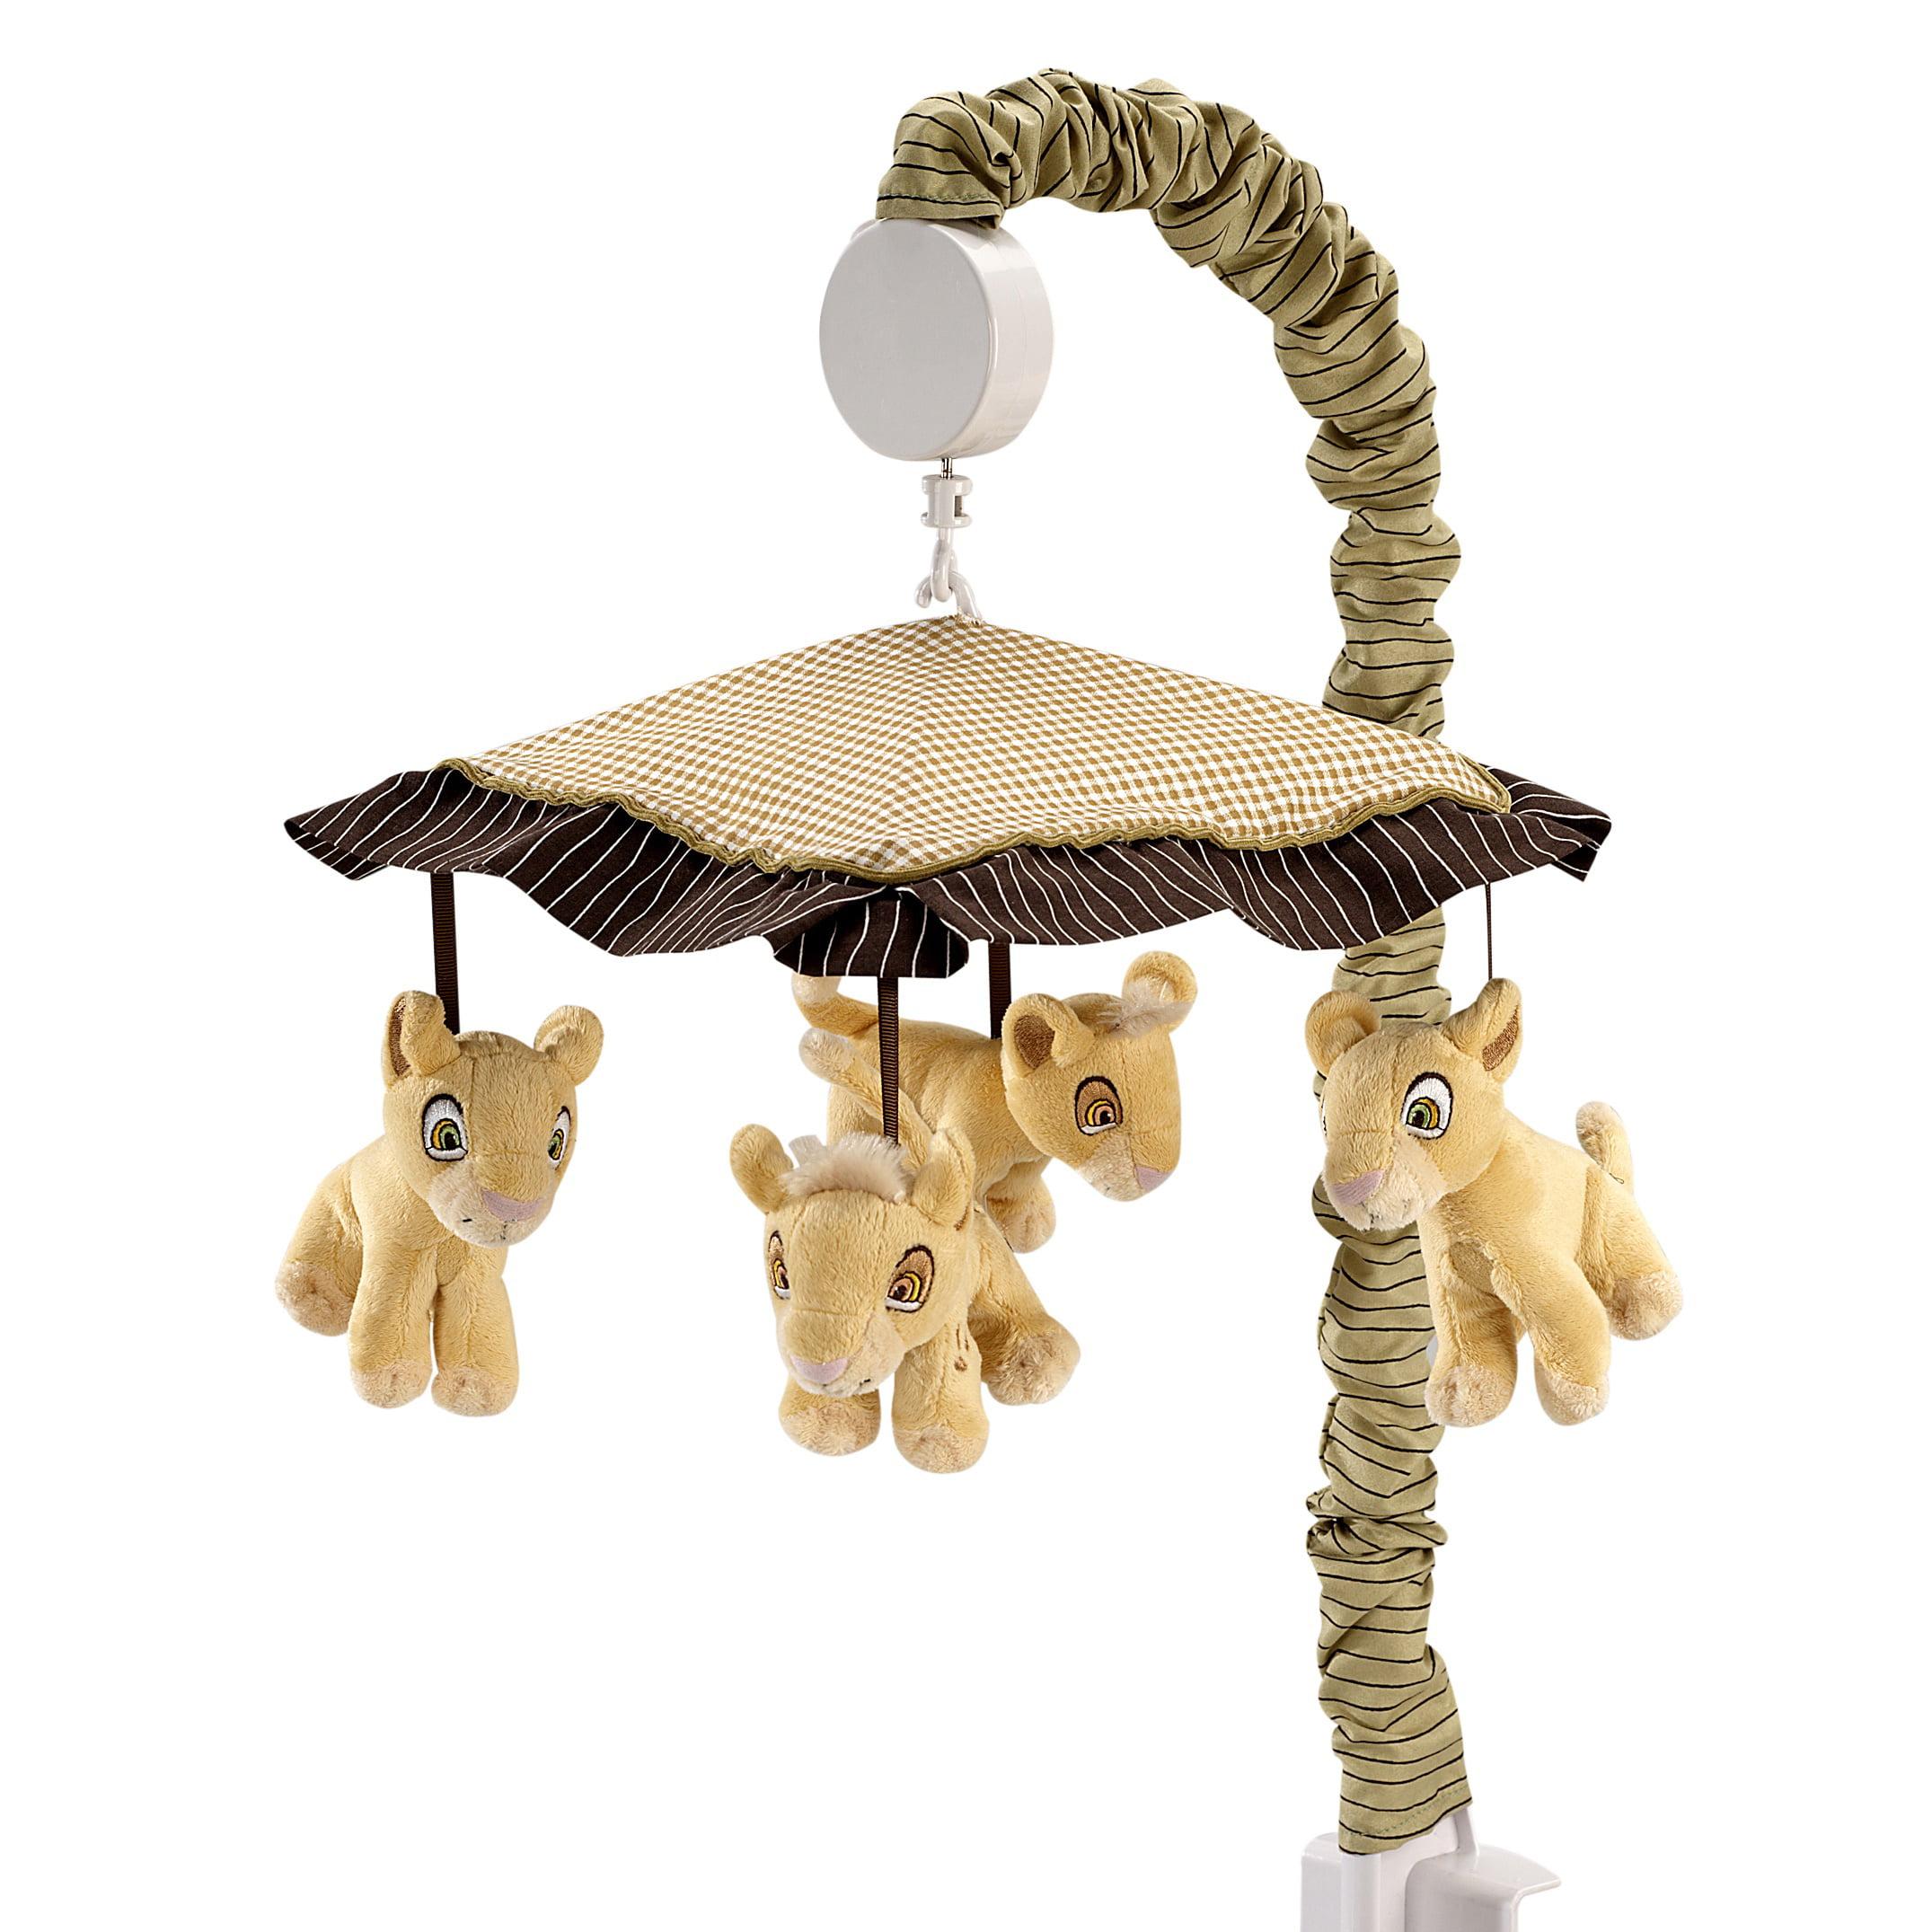 Disney Lion King Simba's Wild Adventure Musical Mobile